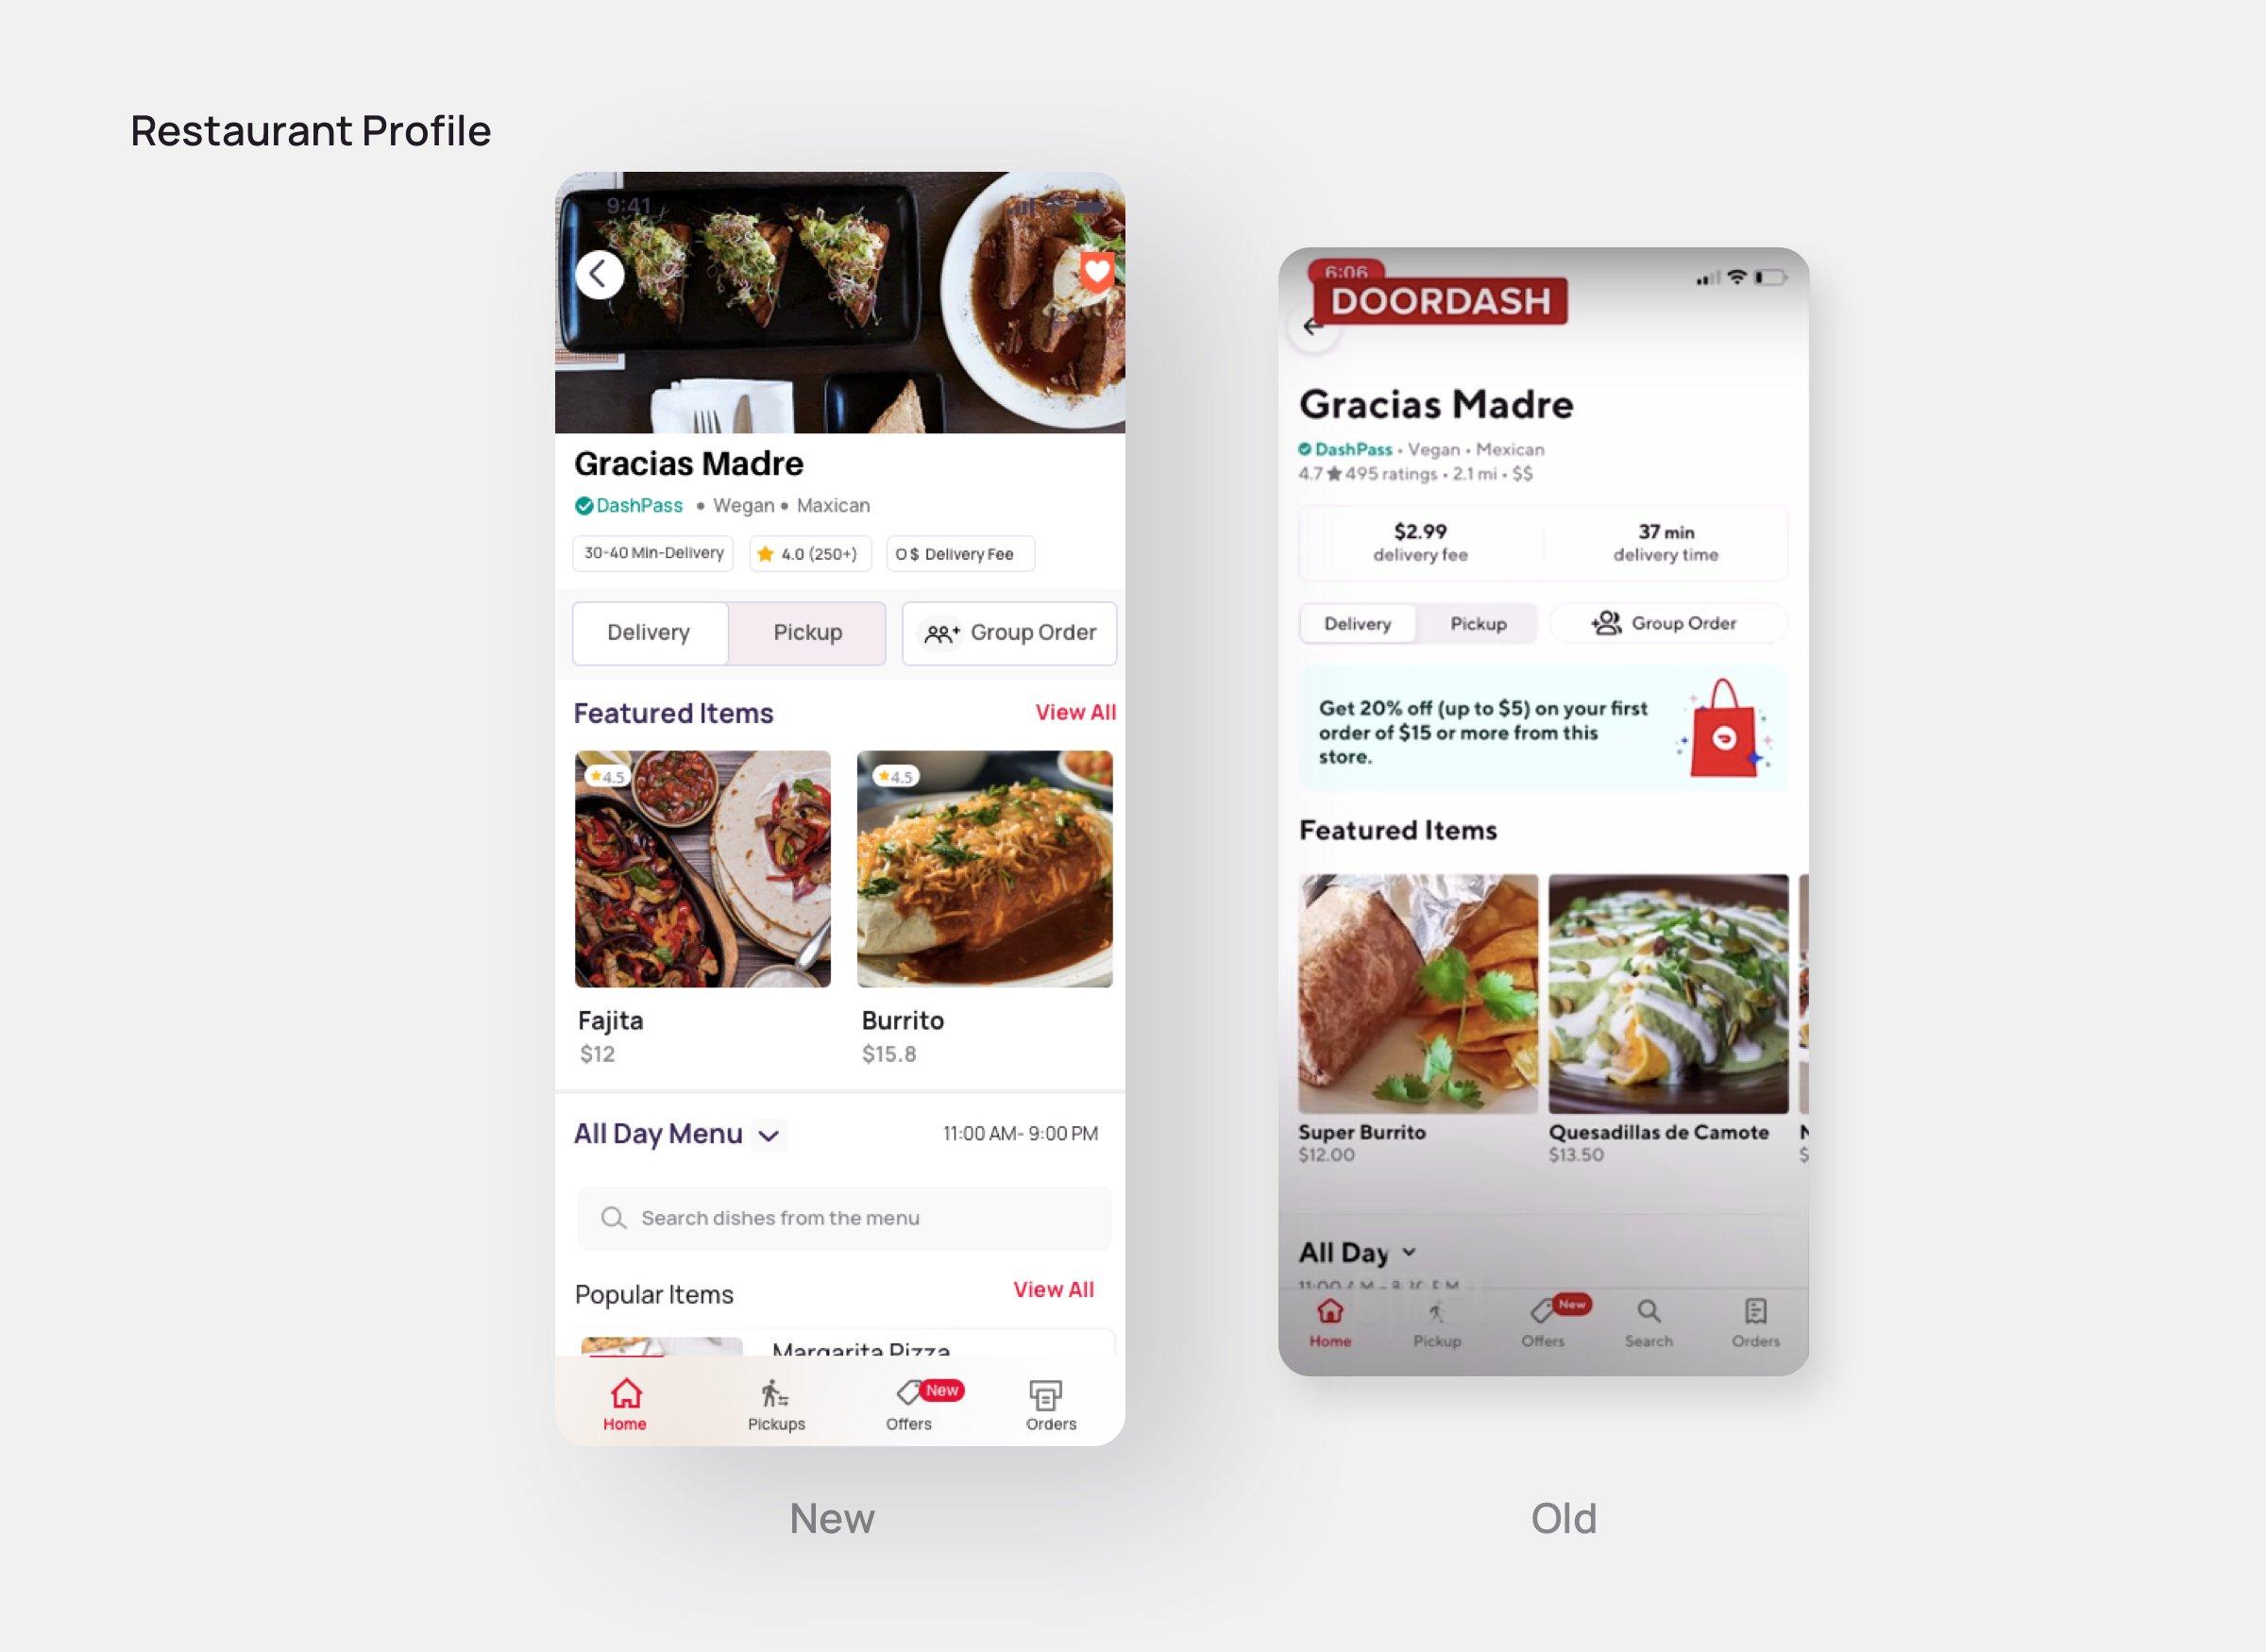 Restaurant Profile-Doordash redesign